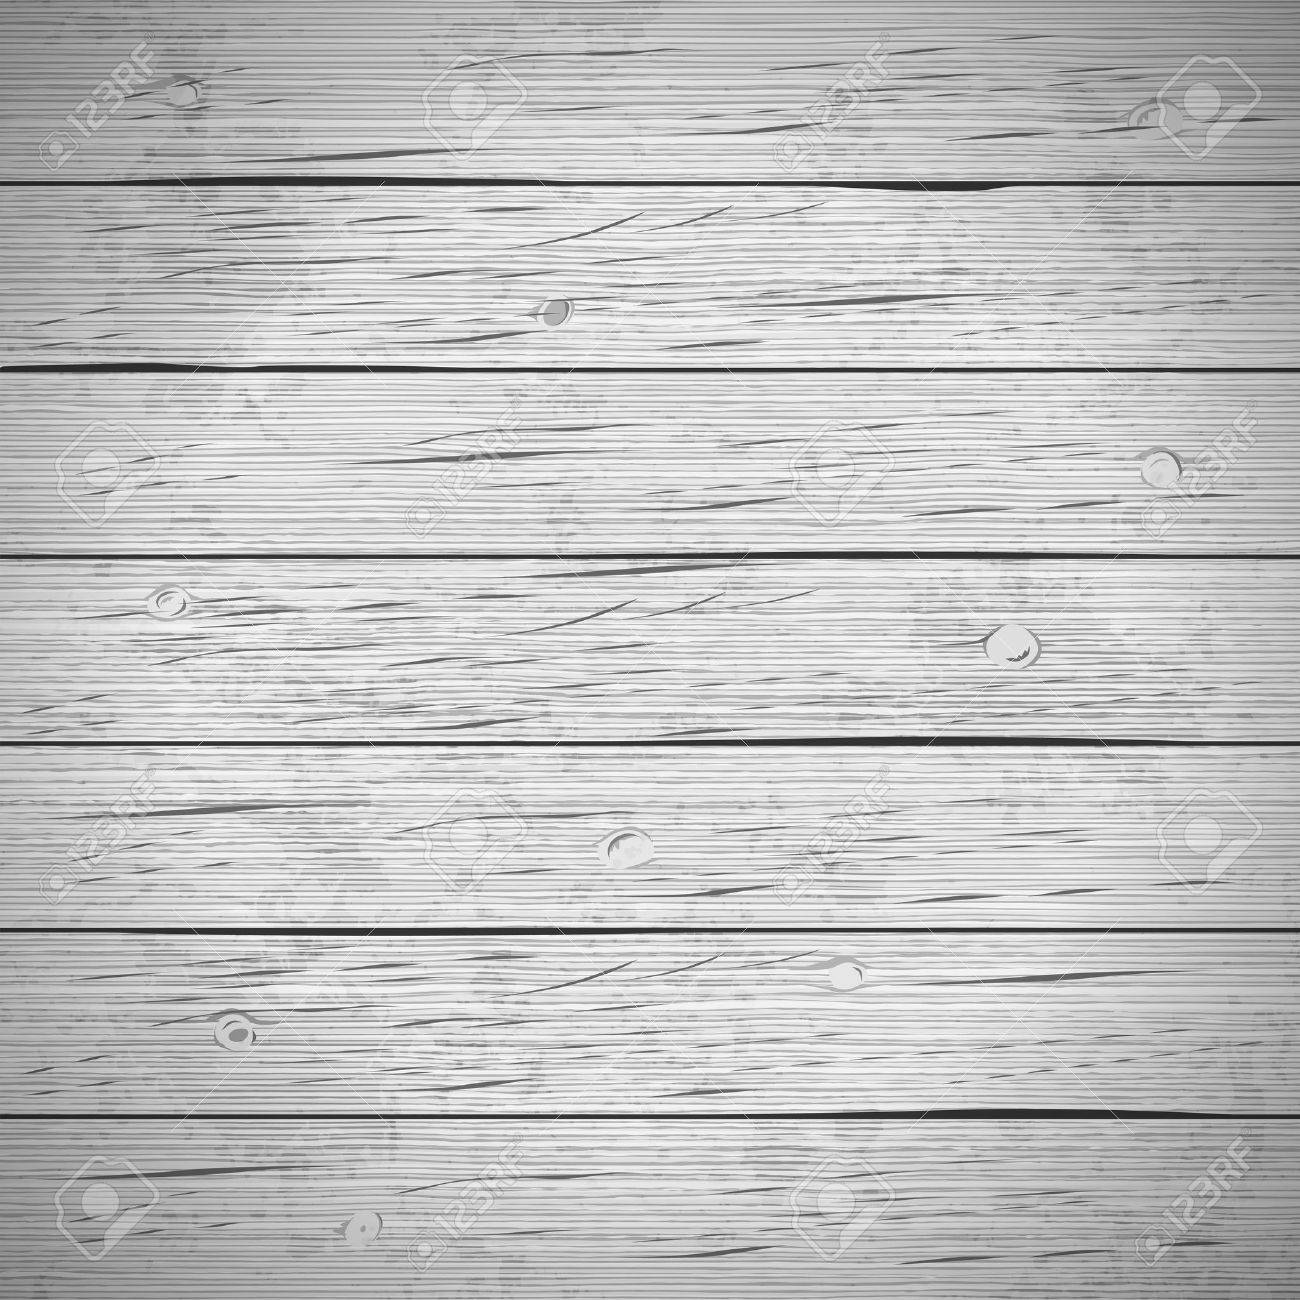 Rustic wood planks vintage background. Vector illustration. - 54724156